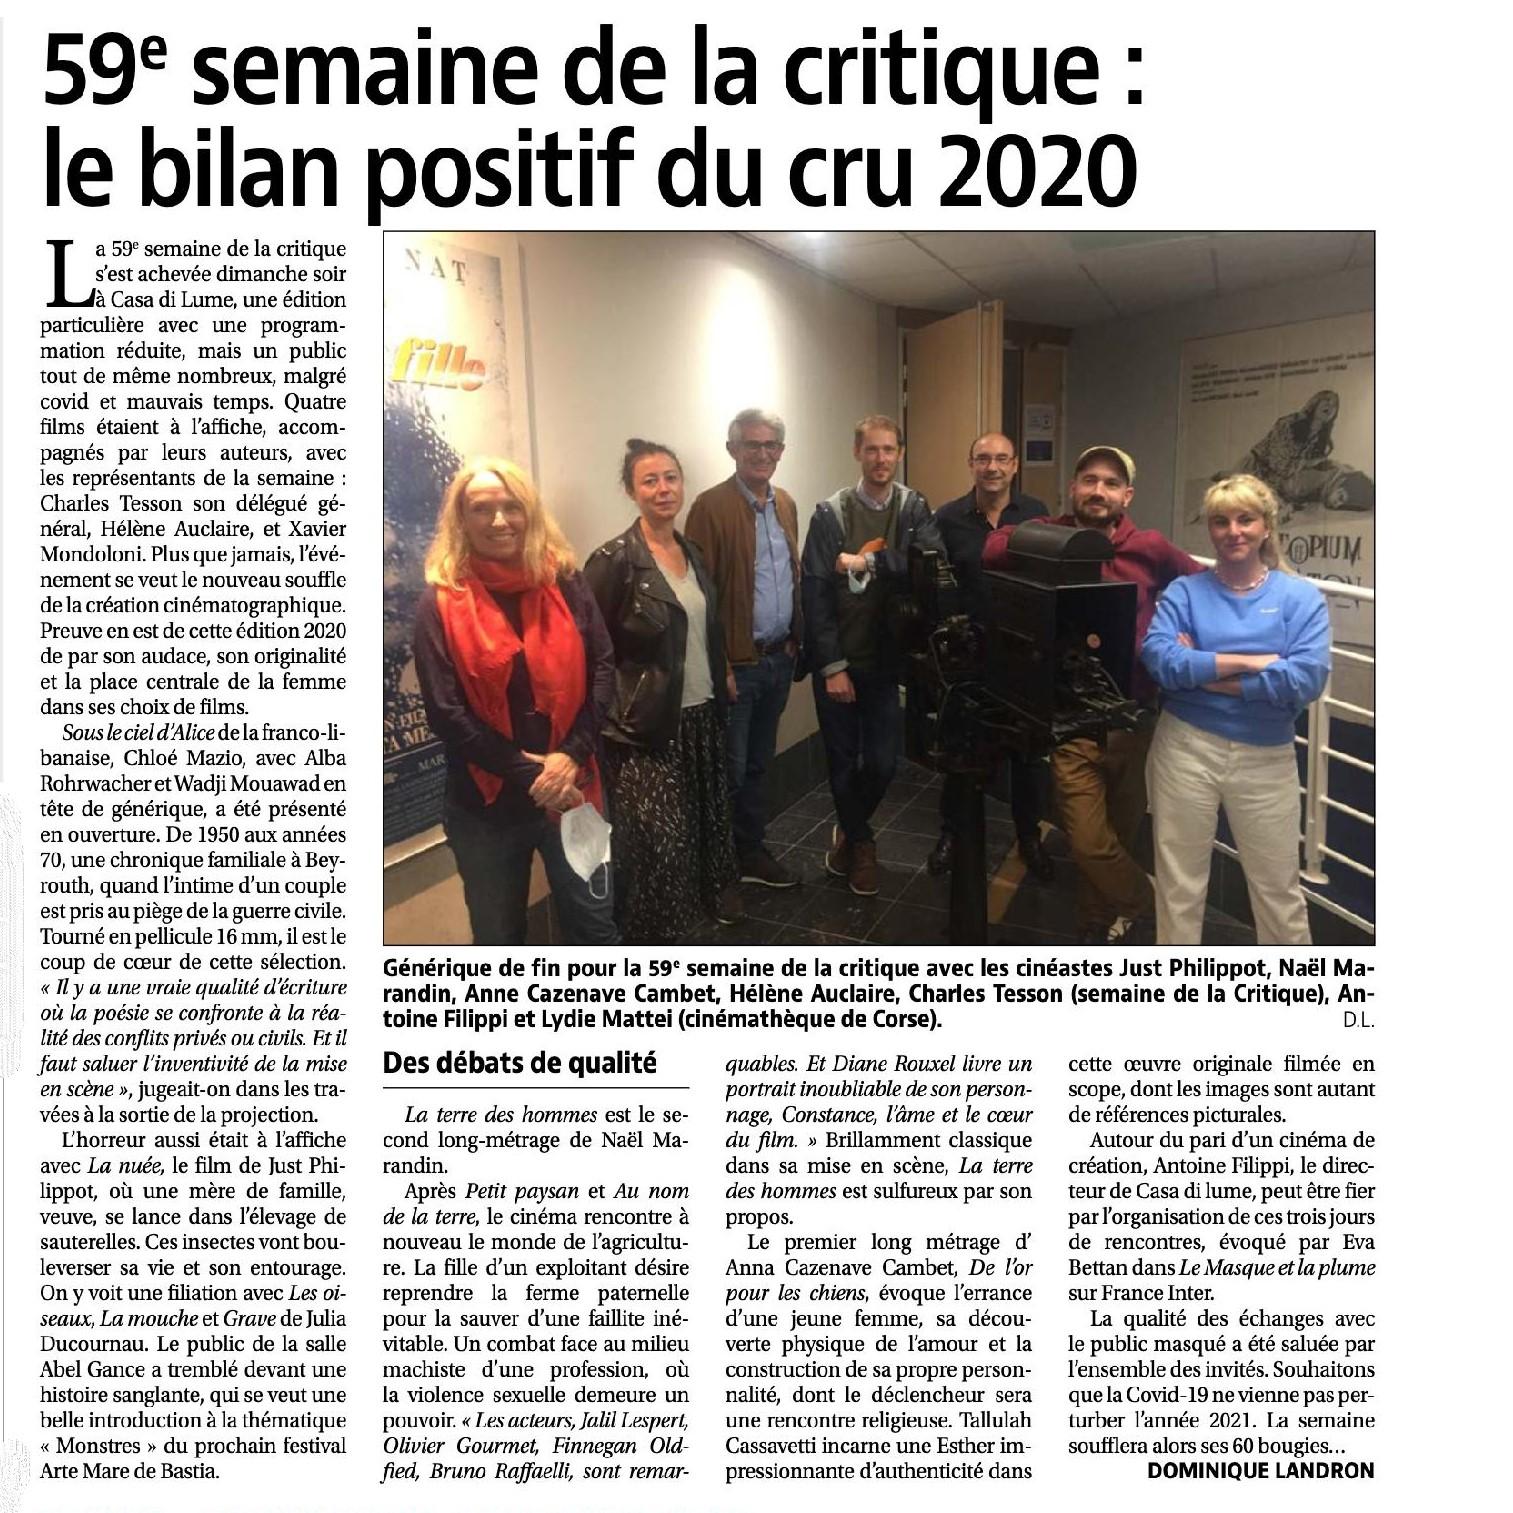 59 ème Semaine de la critique: le bilan positif du cru 2020.